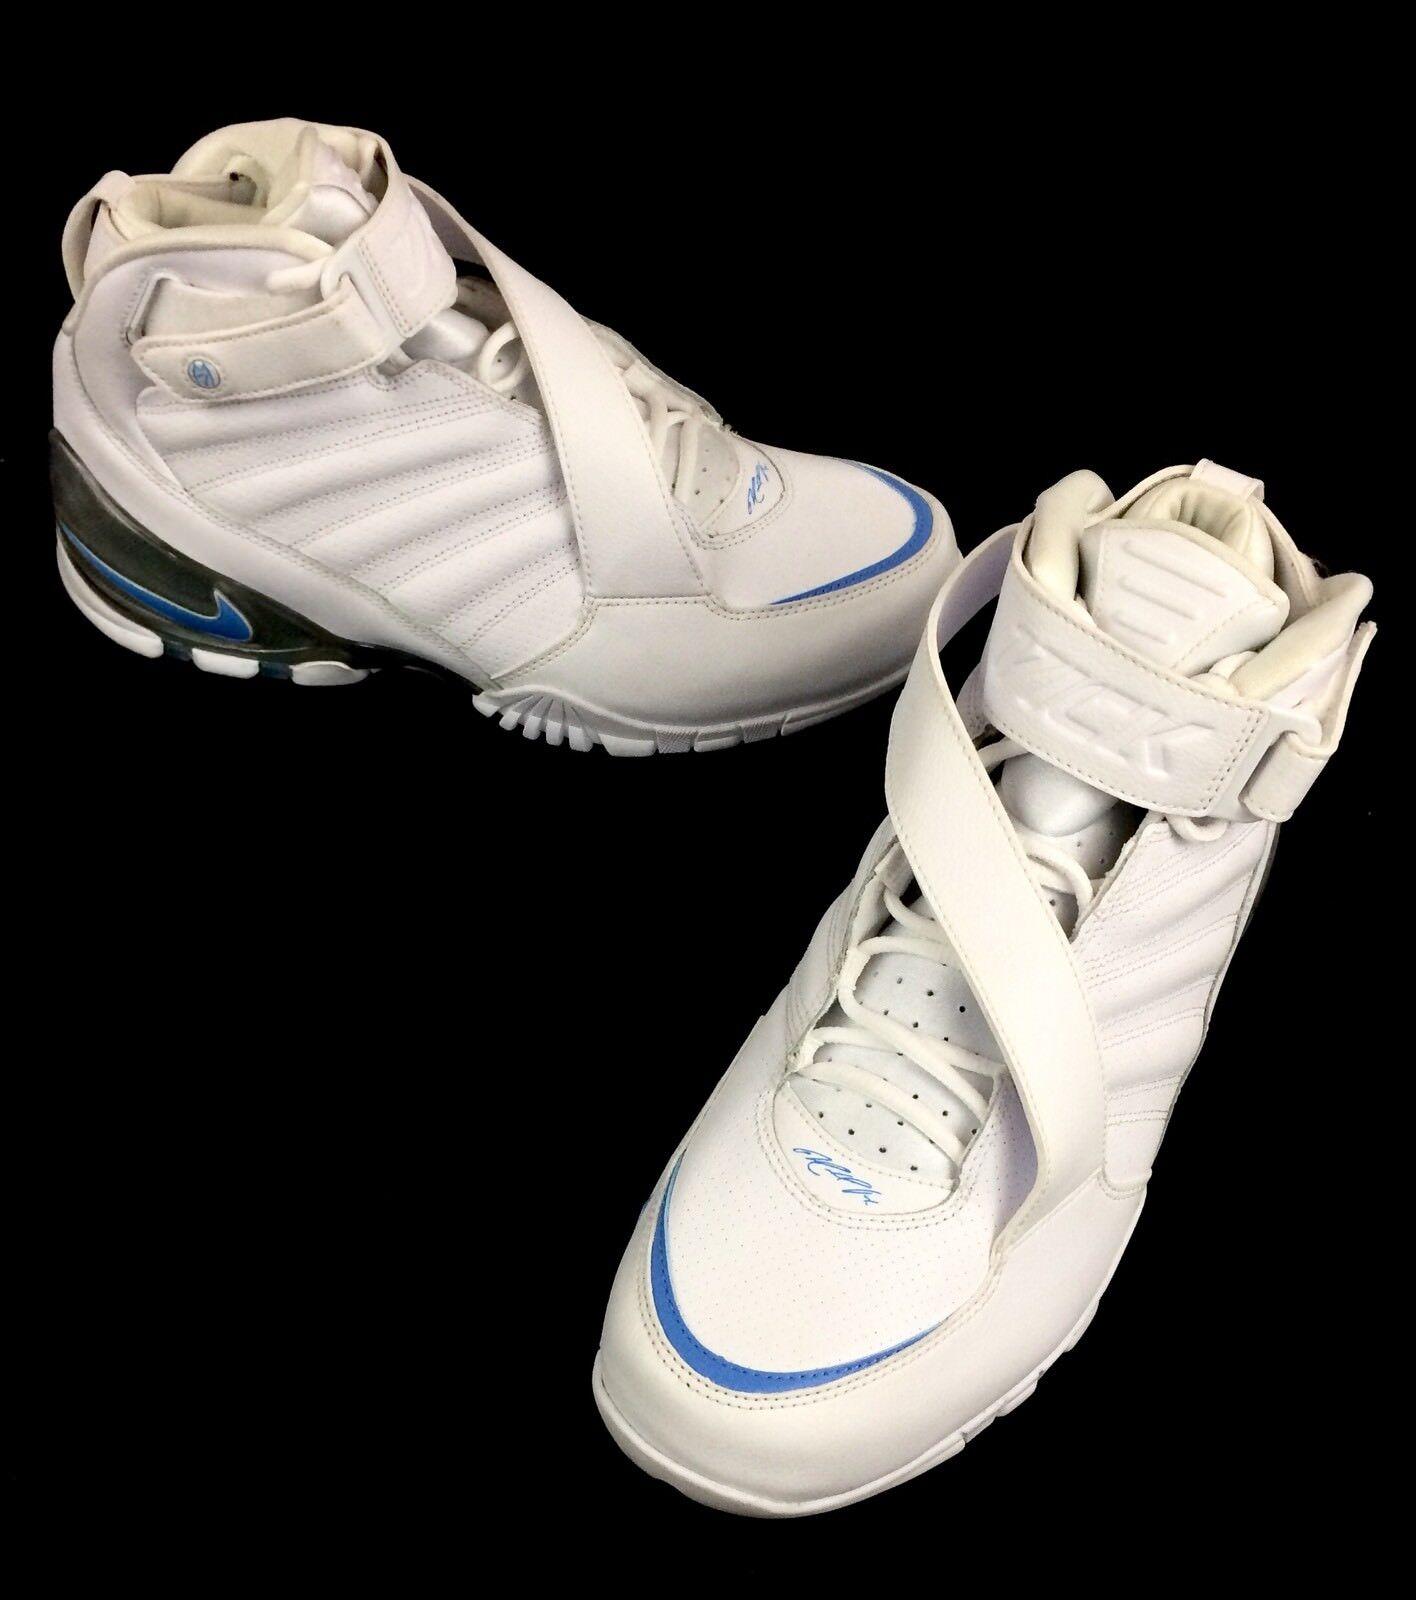 3ad292655d9f  160 Nike Zoom Vick III da723e - work.edclist.com